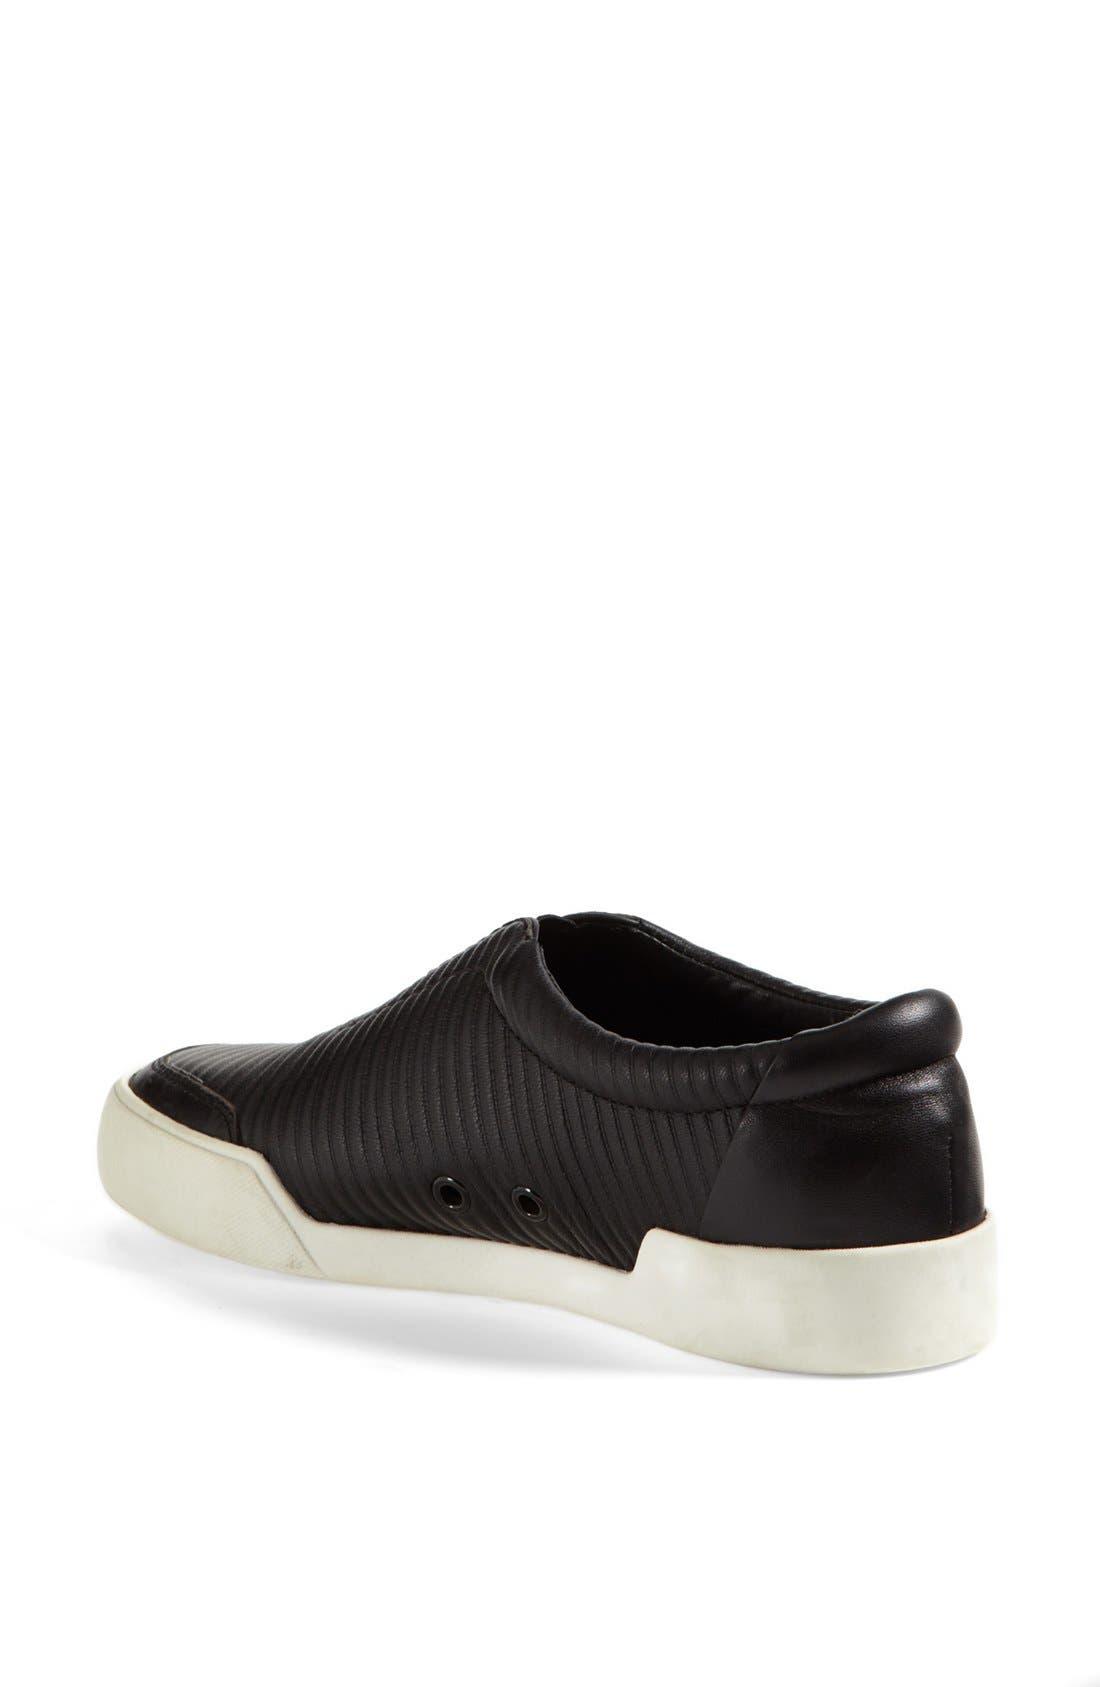 'Morgan' Slip-On Sneaker,                             Alternate thumbnail 2, color,                             Black